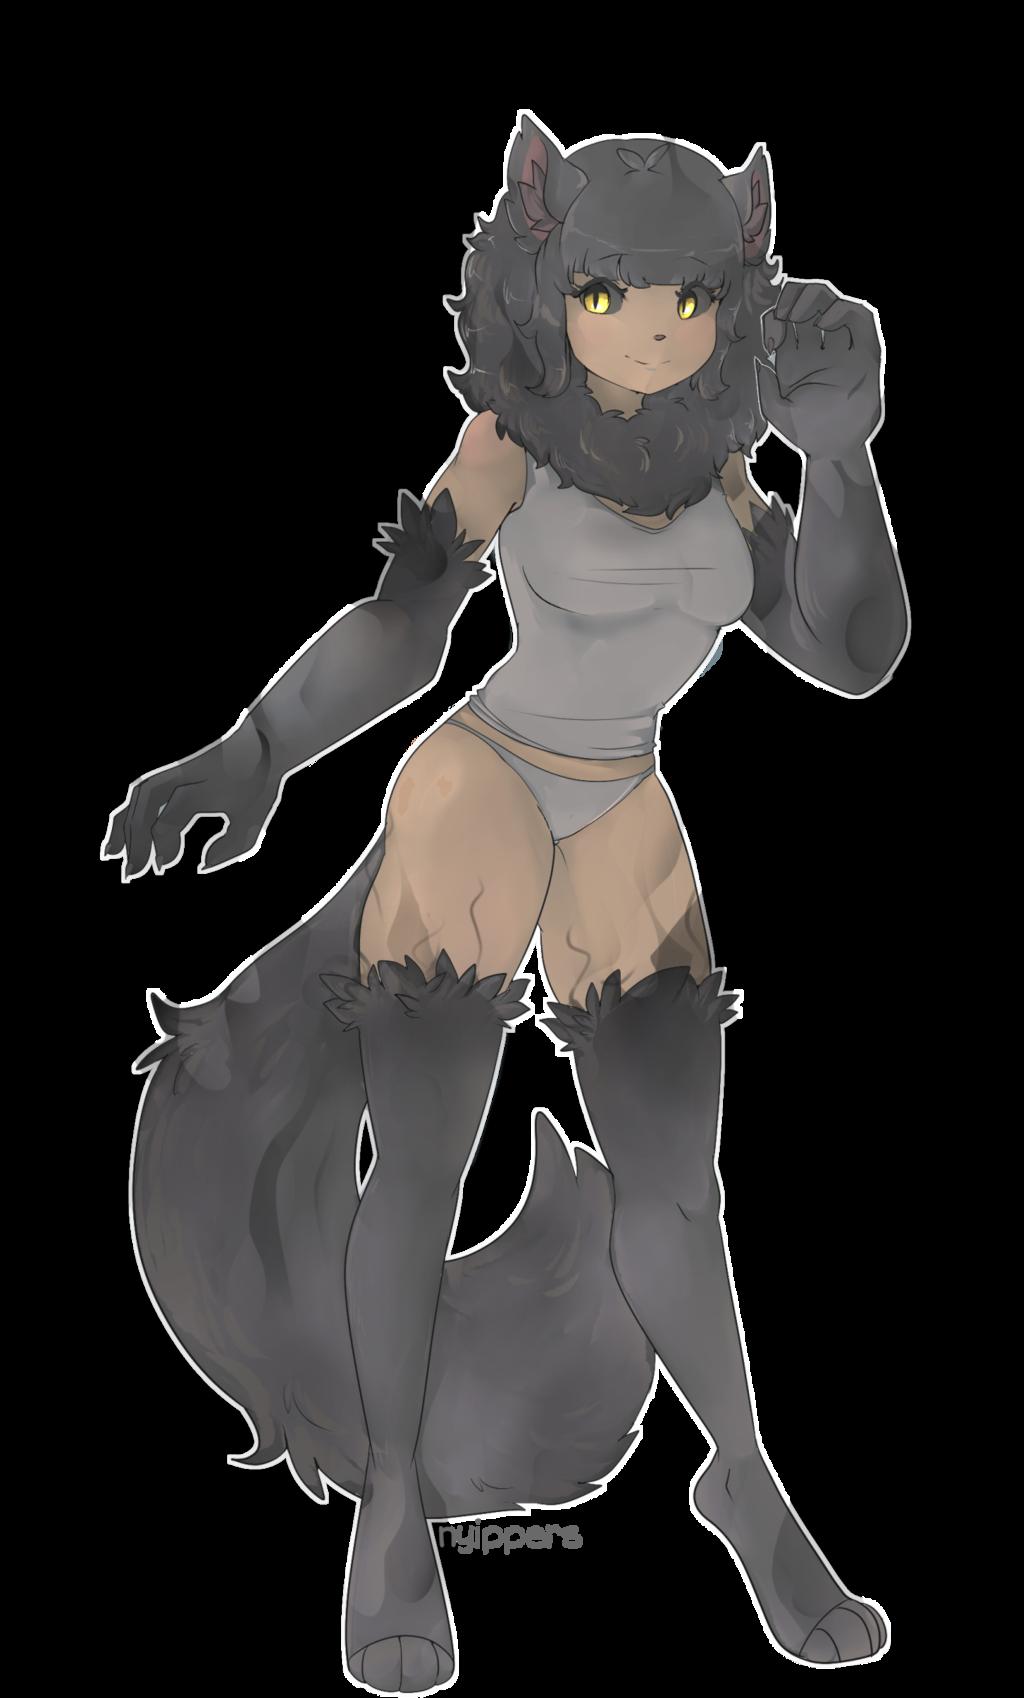 smoky puppy [c]